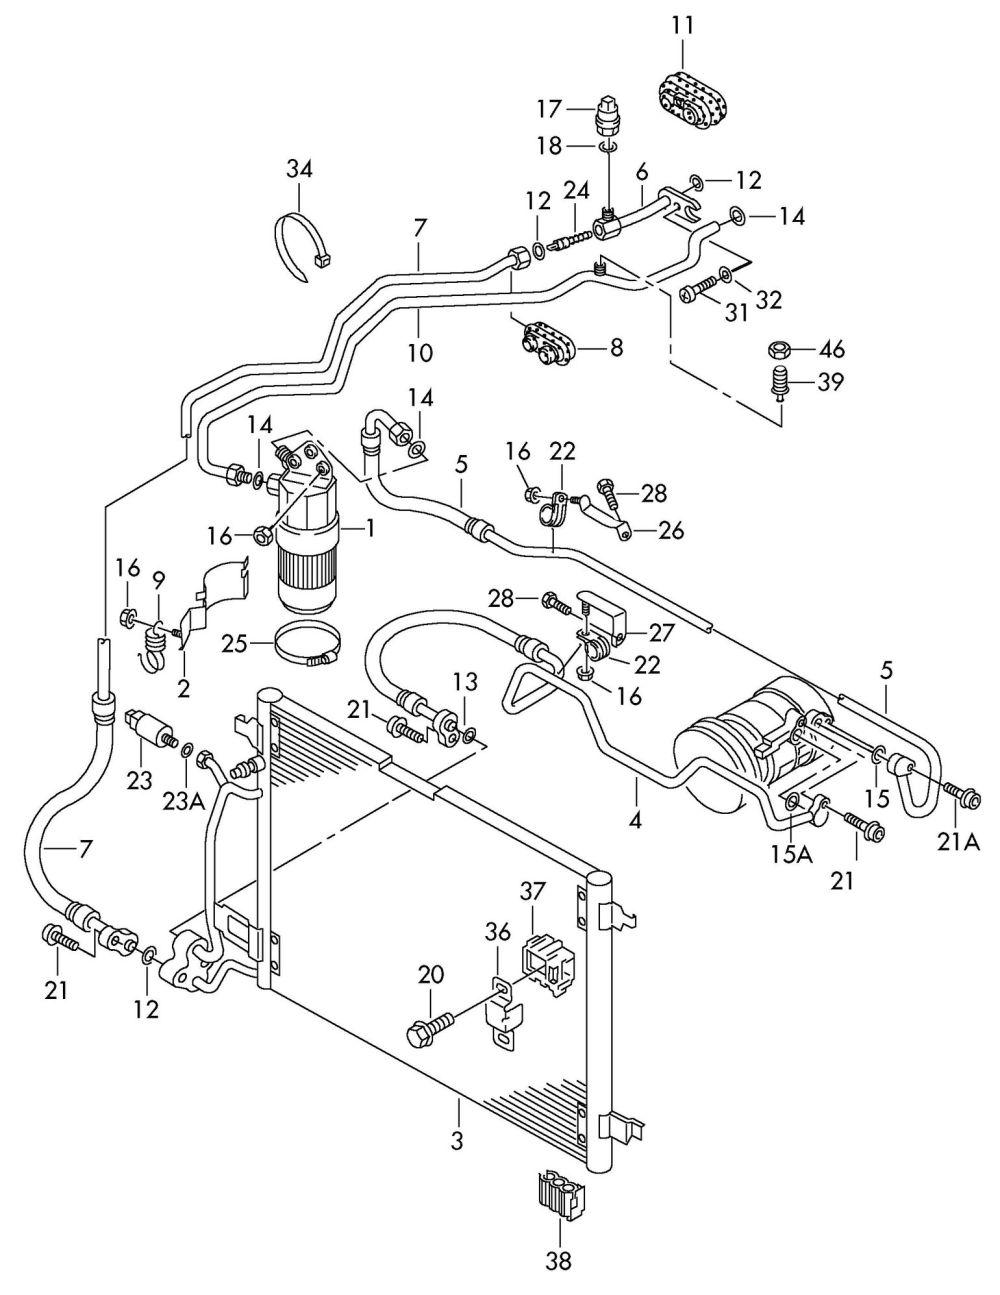 medium resolution of audi air conditioning wiring diagram air conditioning commercial hvac diagram building hvac system diagram